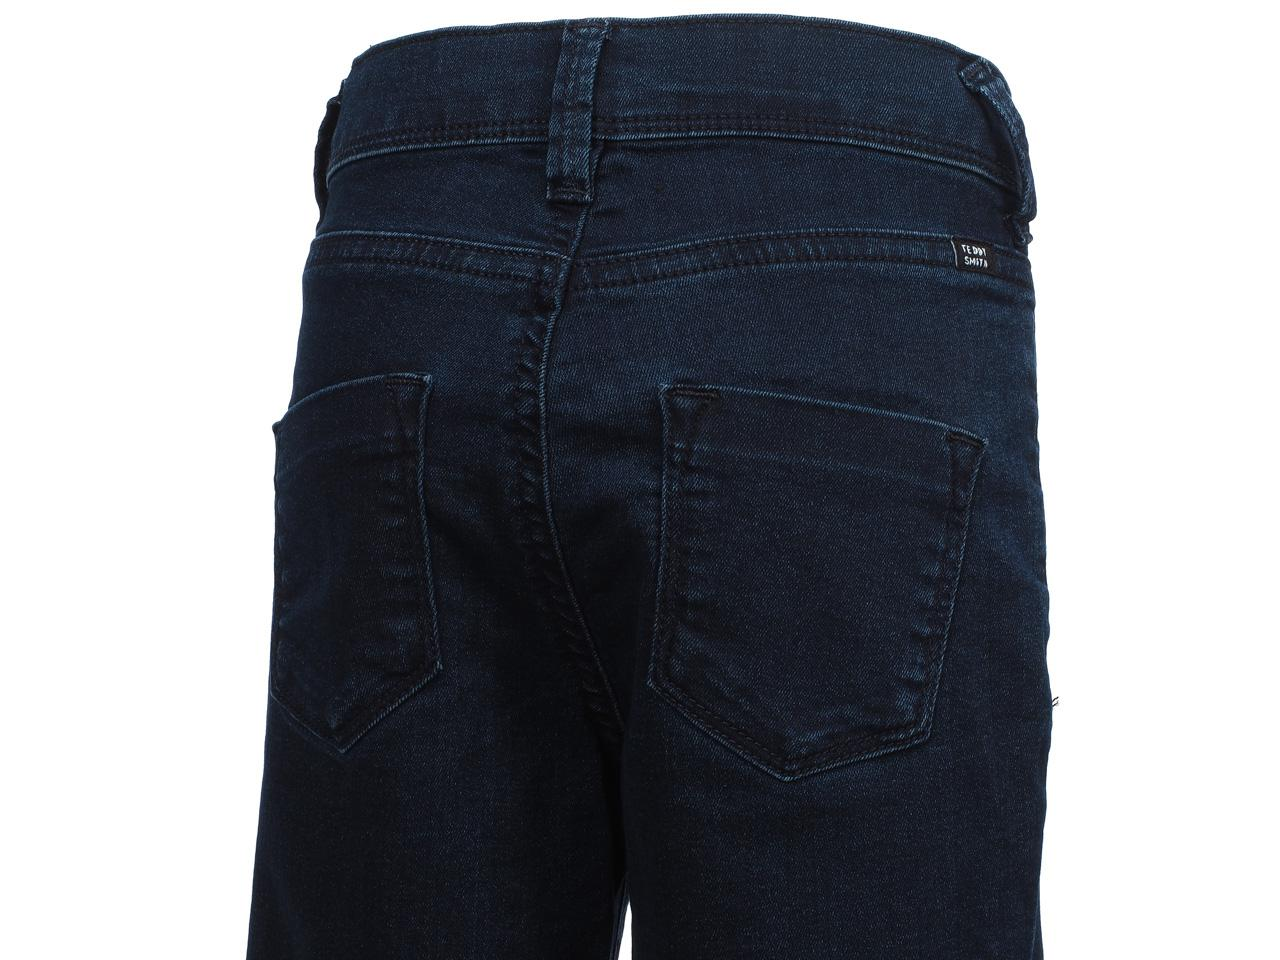 Pantalon-jeans-Teddy-smith-The-jeg-navy-jeans-girl-Bleu-24306-Neuf miniature 3